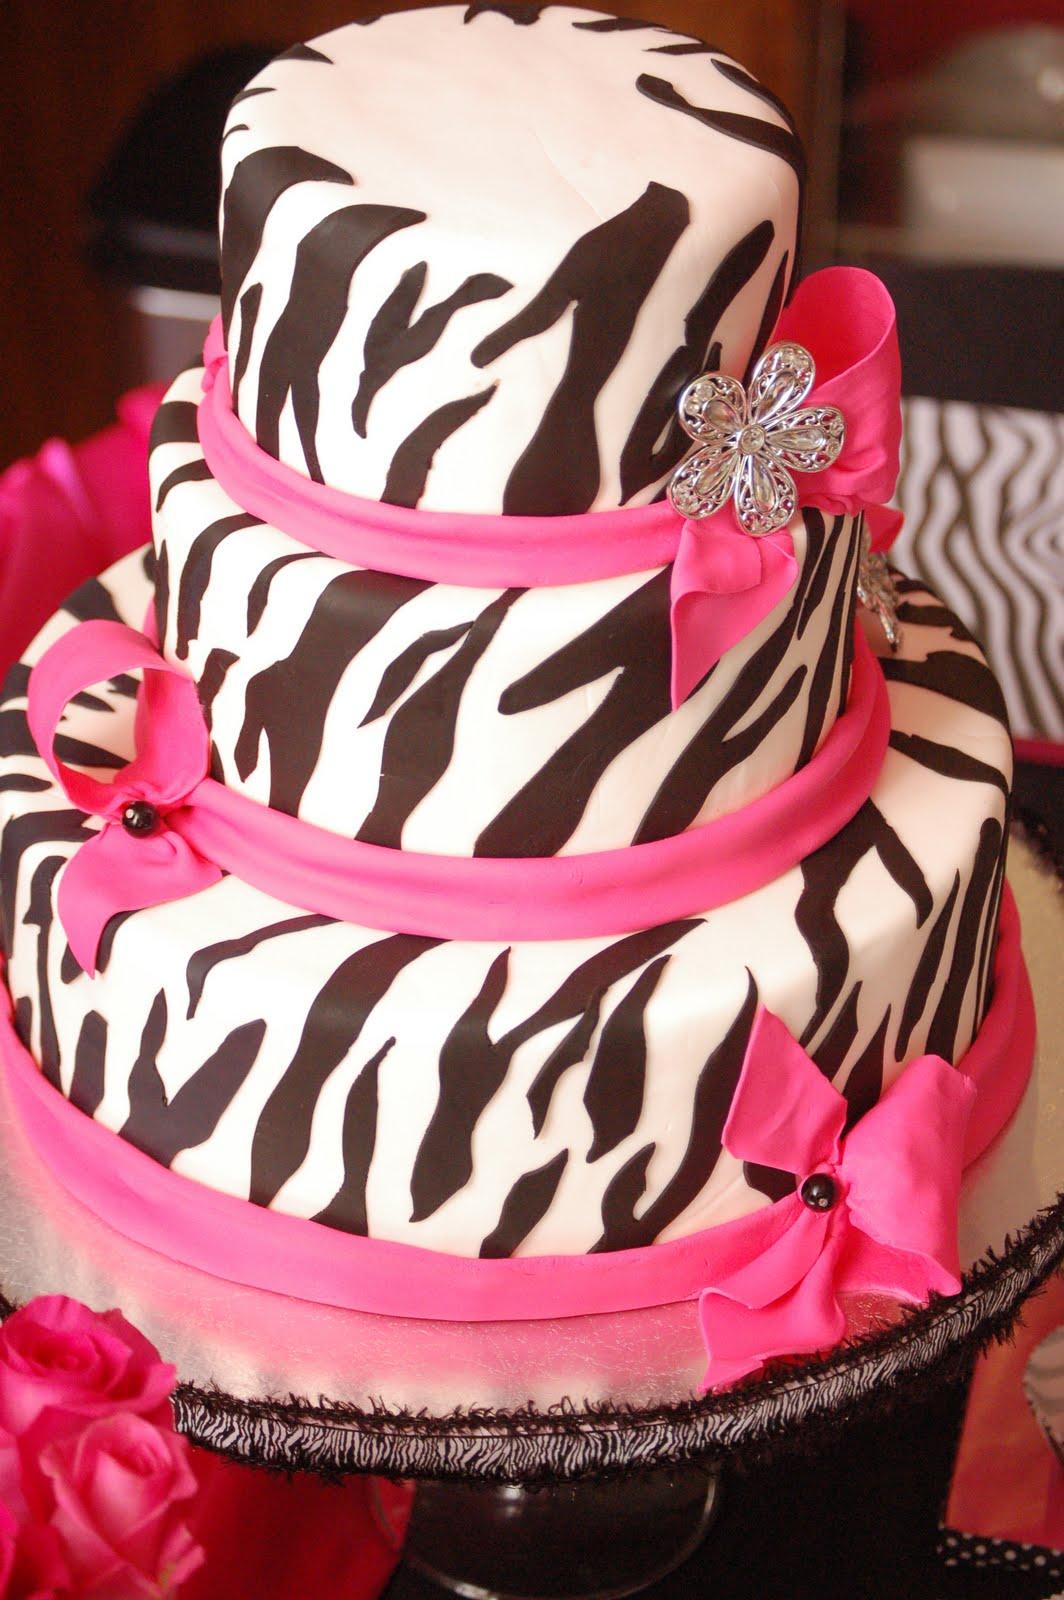 Cakes by Tatiana: Diva Zebra Cake